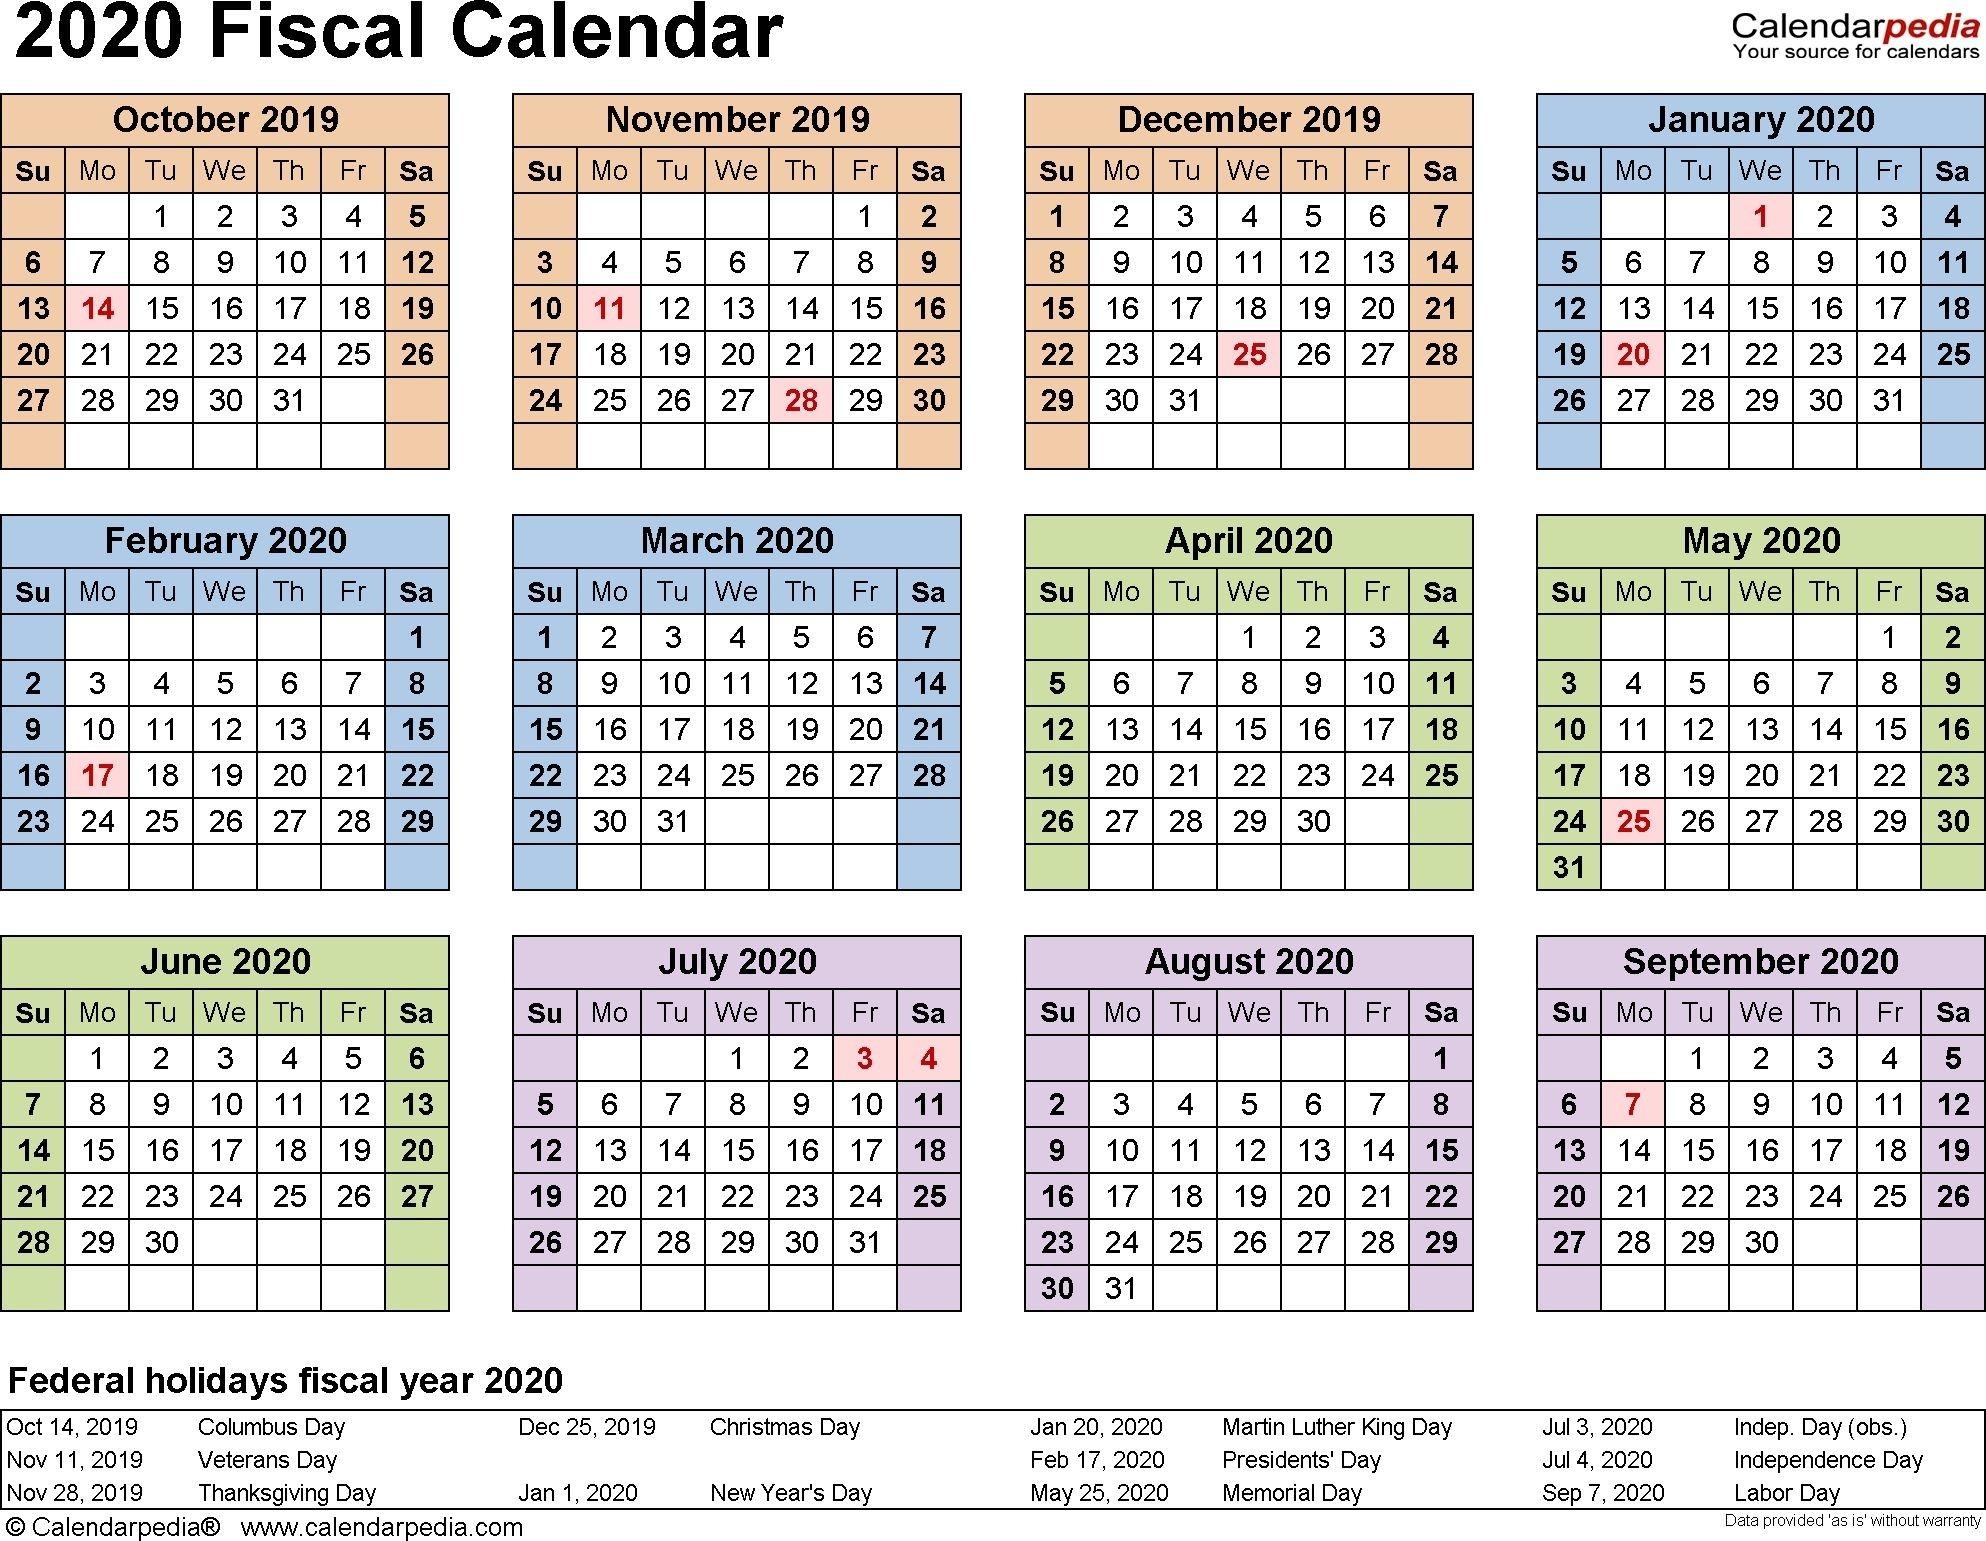 2019 2020 Financial Year Calendar In 2020 | Payroll Calendar  18/19 Financial Year Dates